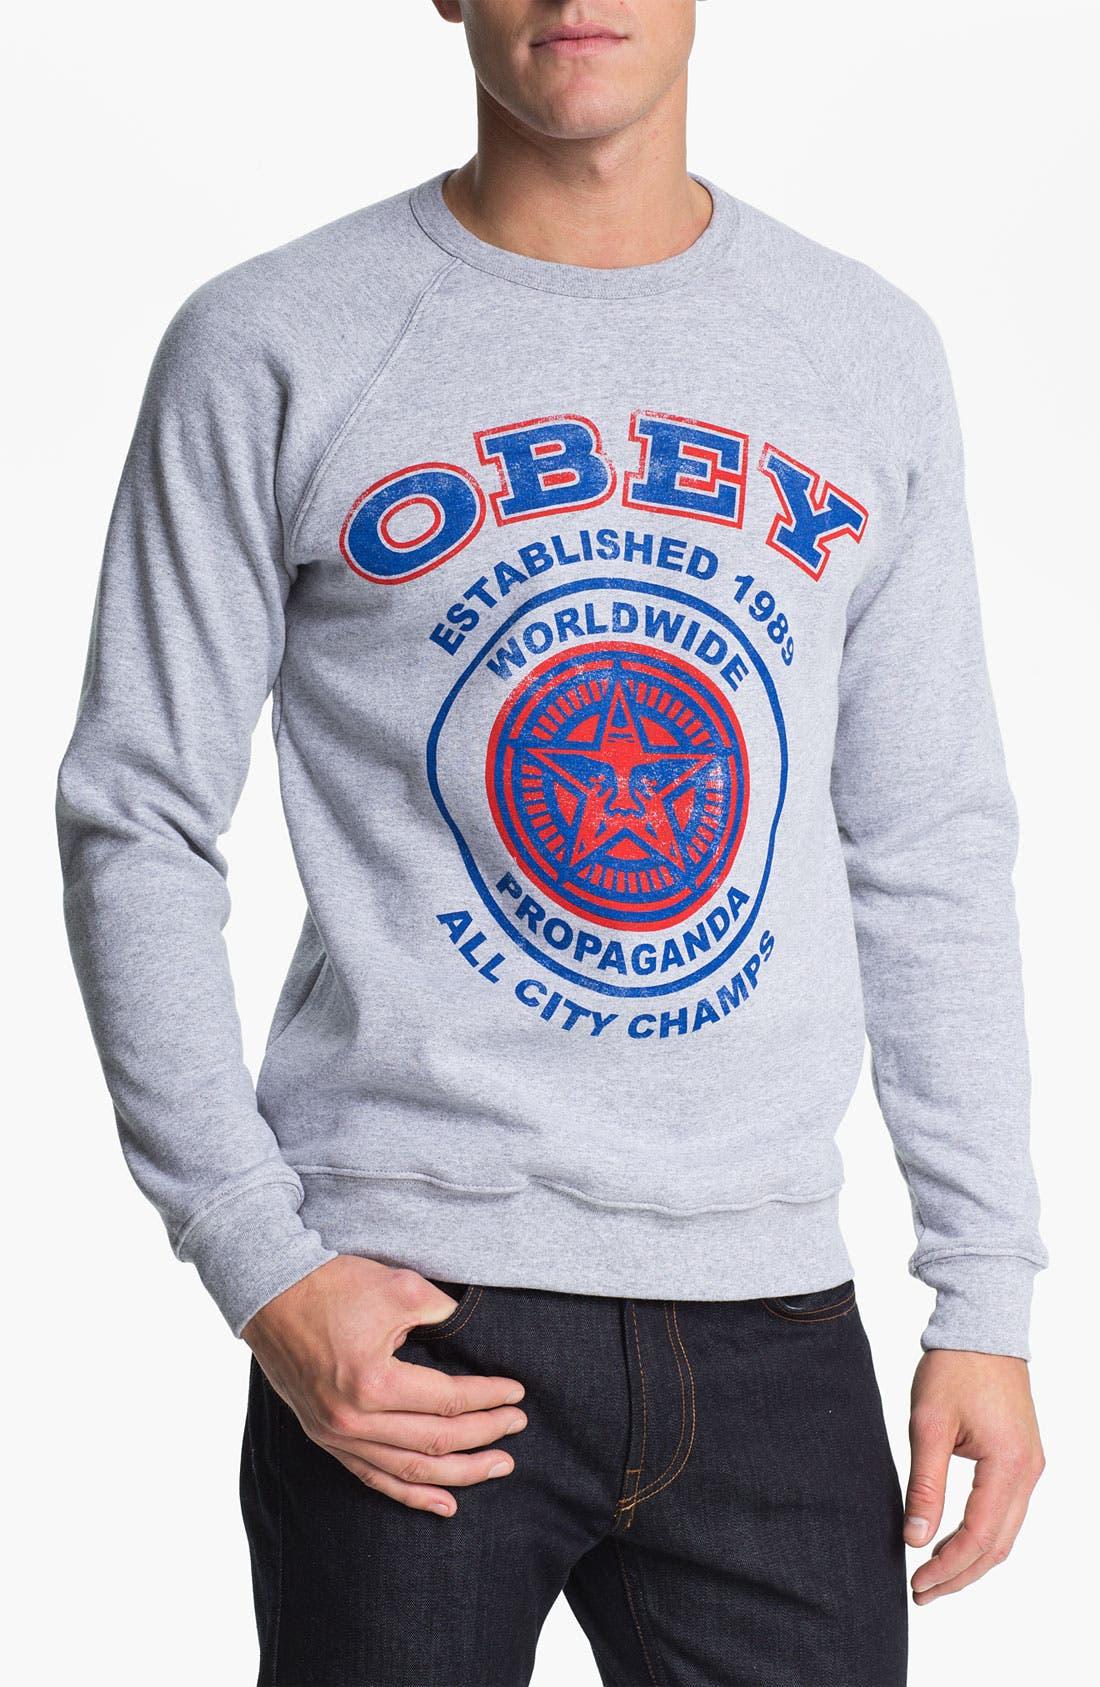 Main Image - Obey 'All City Champs' Graphic Crewneck Sweatshirt